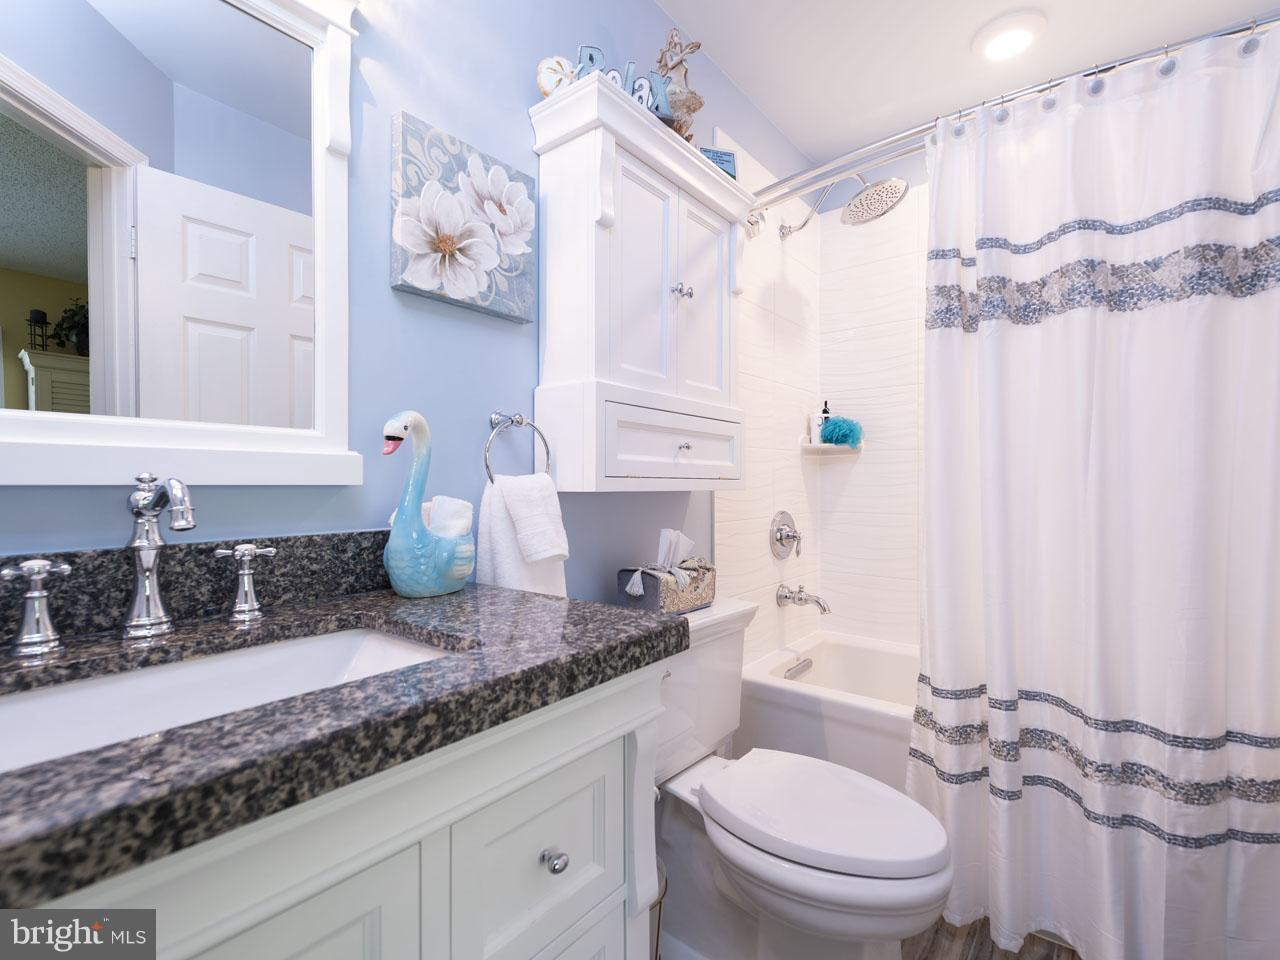 1002640508-300537942924-2021-07-22-05-00-38     Pinecrest   Alexandria Delaware Real Estate For Sale   MLS# 1002640508  - Best of Northern Virginia